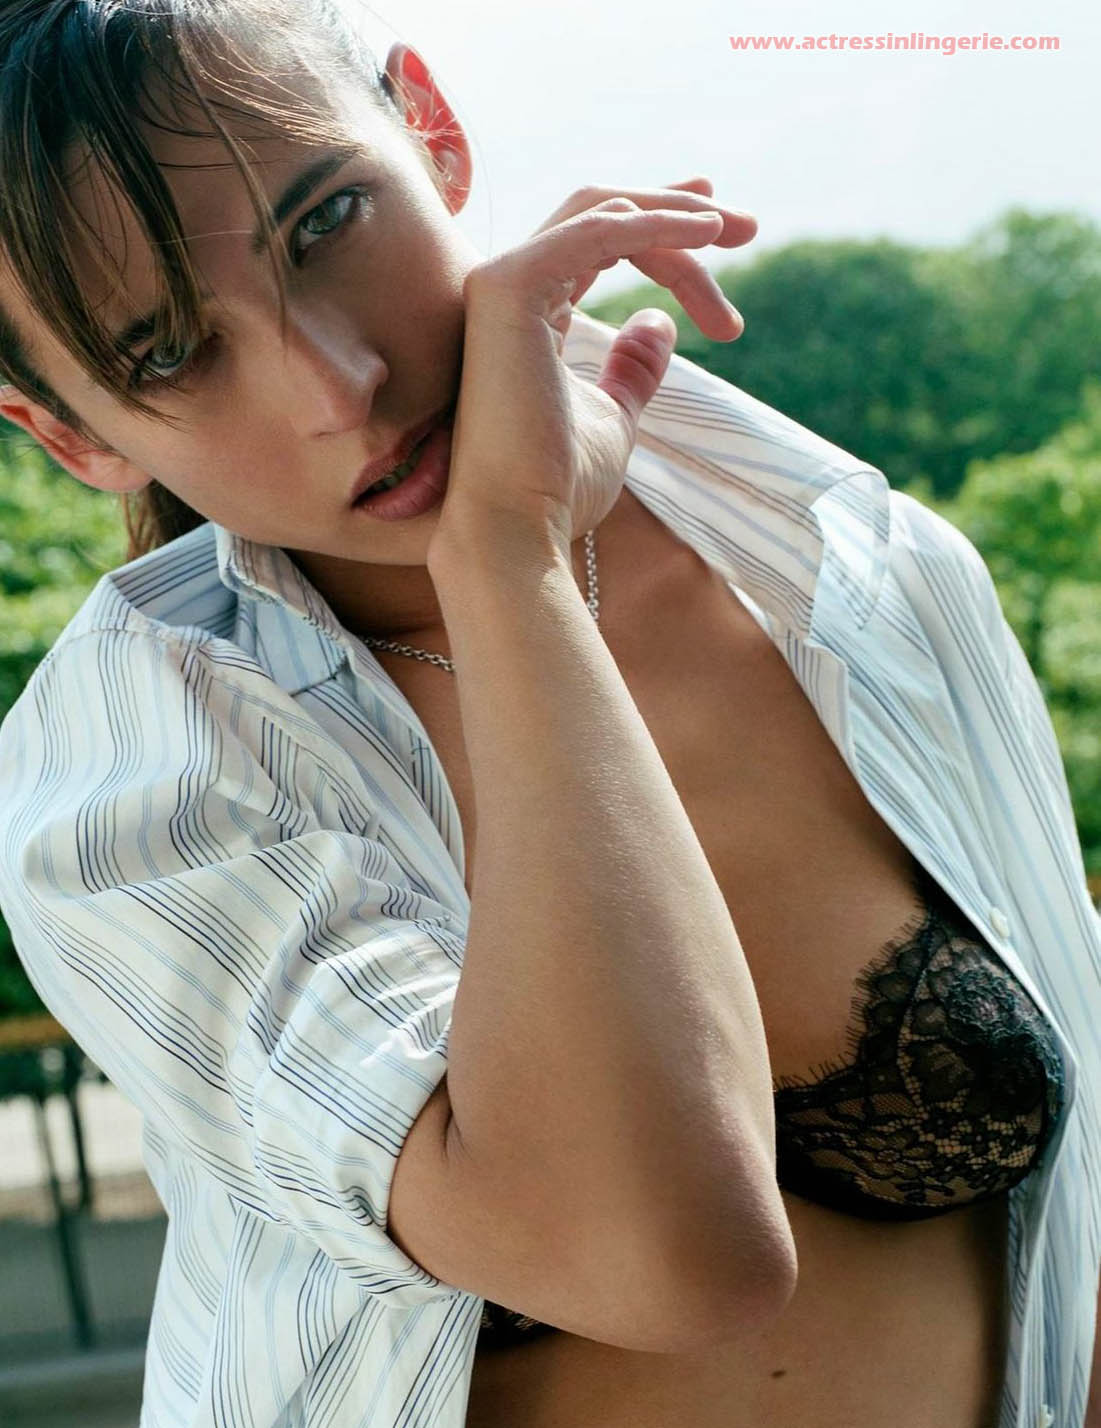 http://1.bp.blogspot.com/_JFX5_9i0Xng/S_EJU-YeWsI/AAAAAAAAD8M/muFW24Yz44c/s1600/Sophie-Marceau-Hot_Underwear+1.jpg